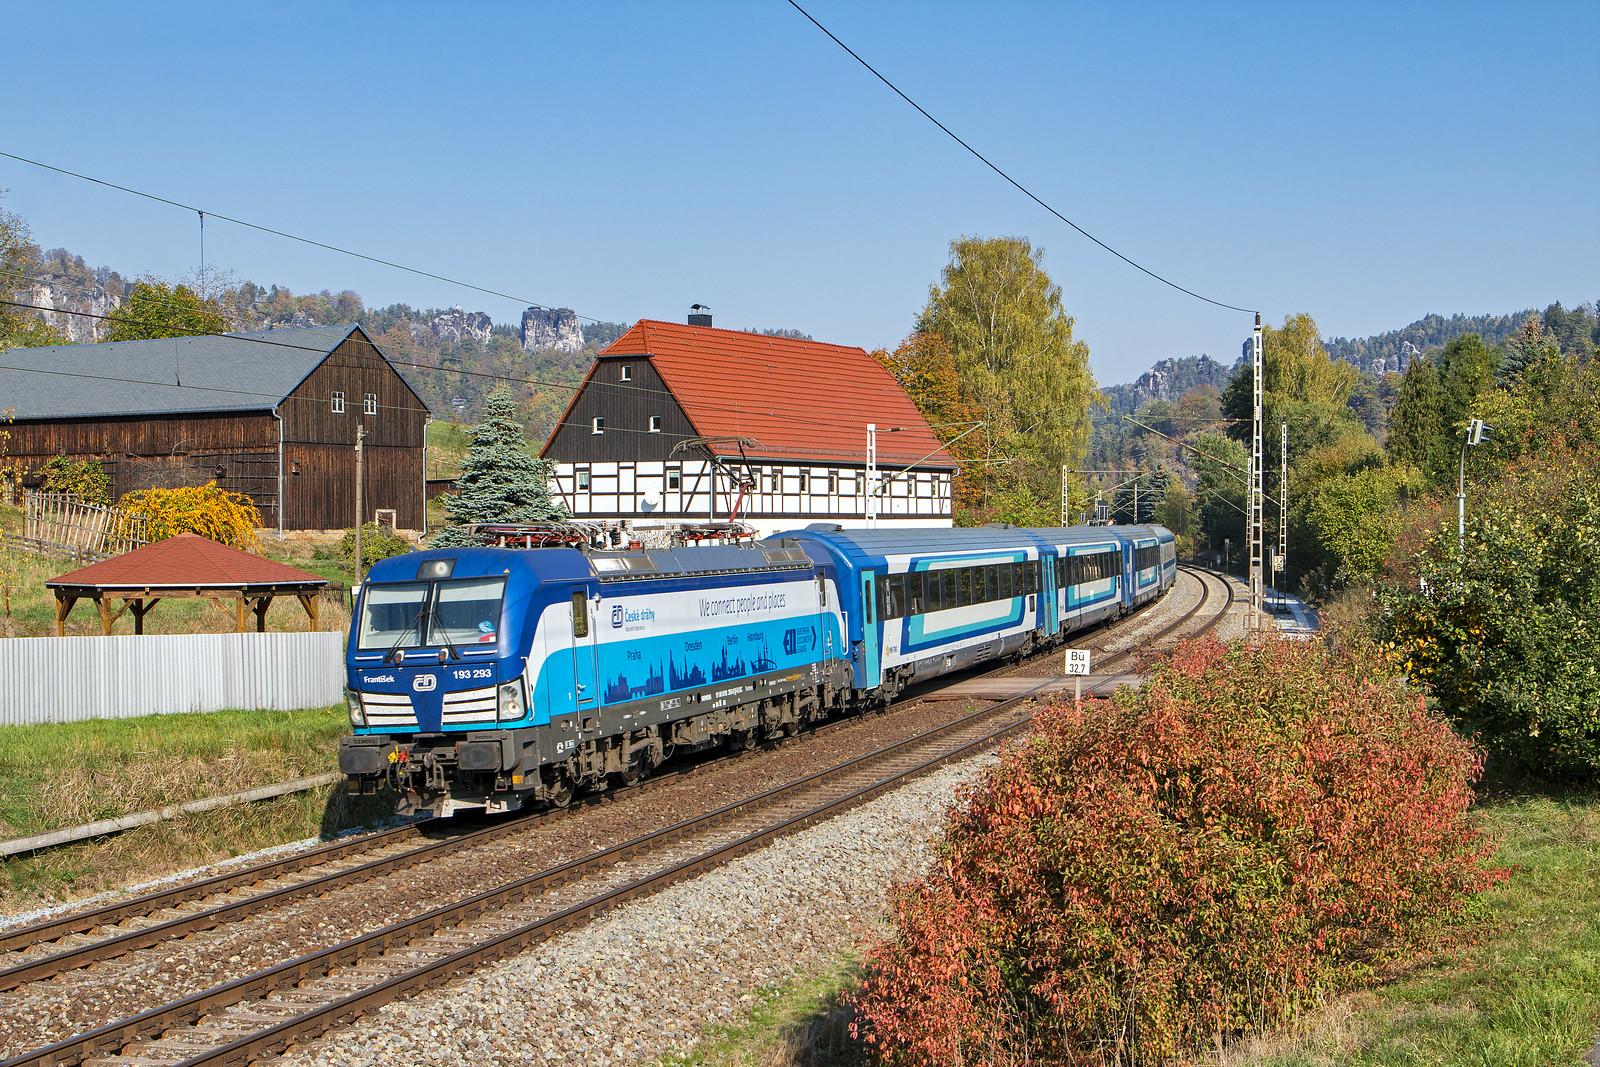 Kurort Rathen, 17 oktober 2018 | ČD 193 293